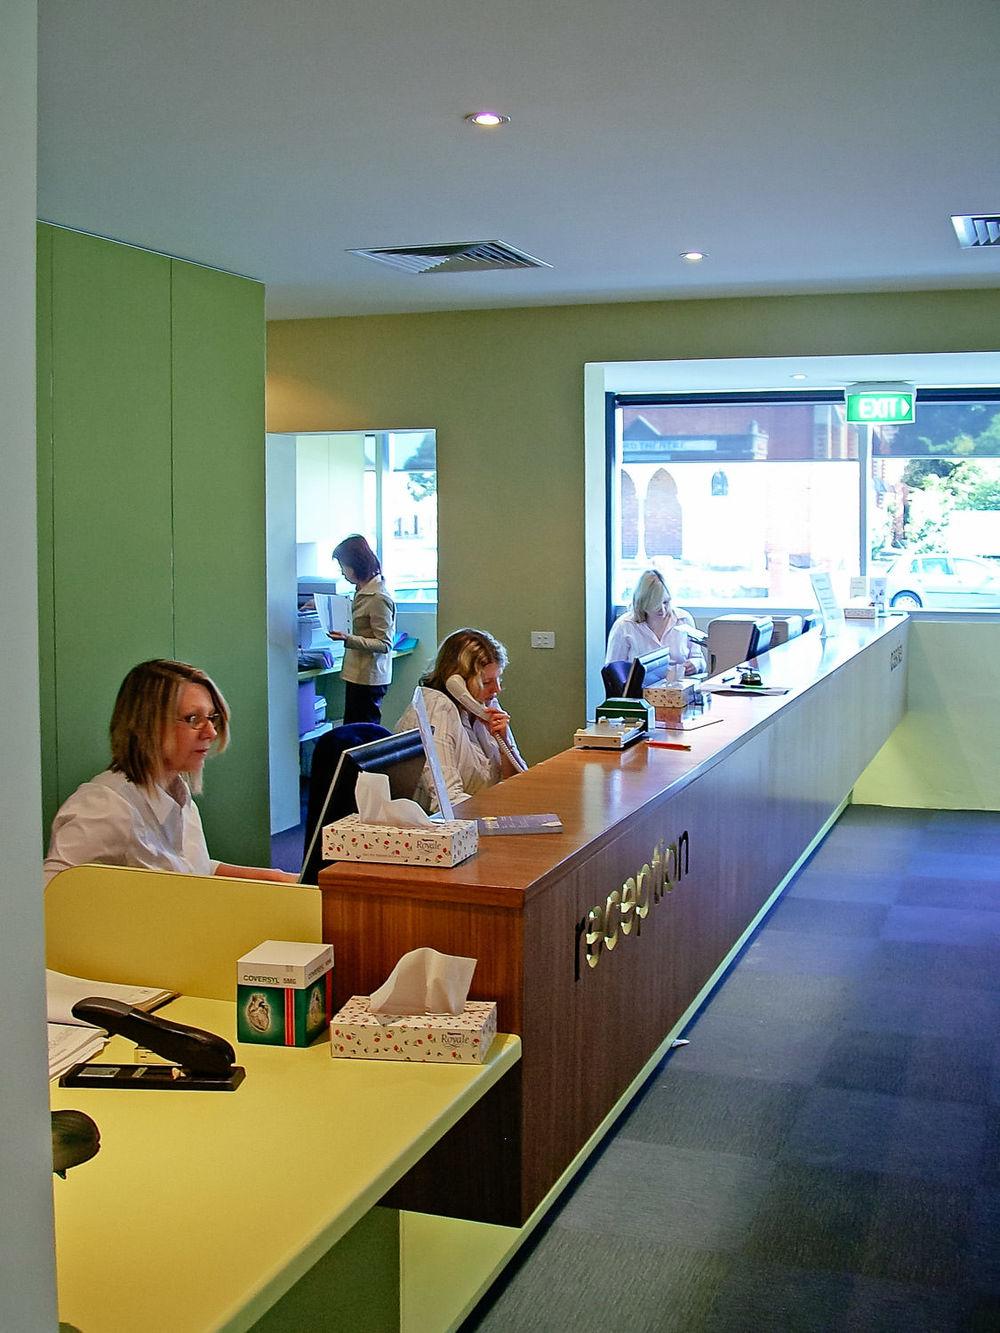 box-hill-medical-centre-7.jpg